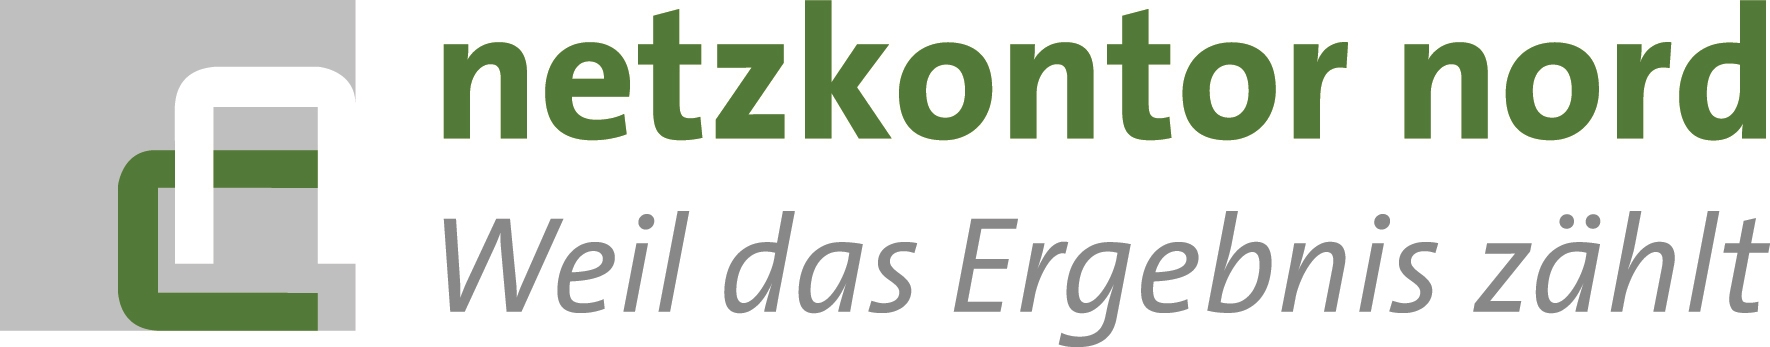 Logo netzkontor nord gmbH